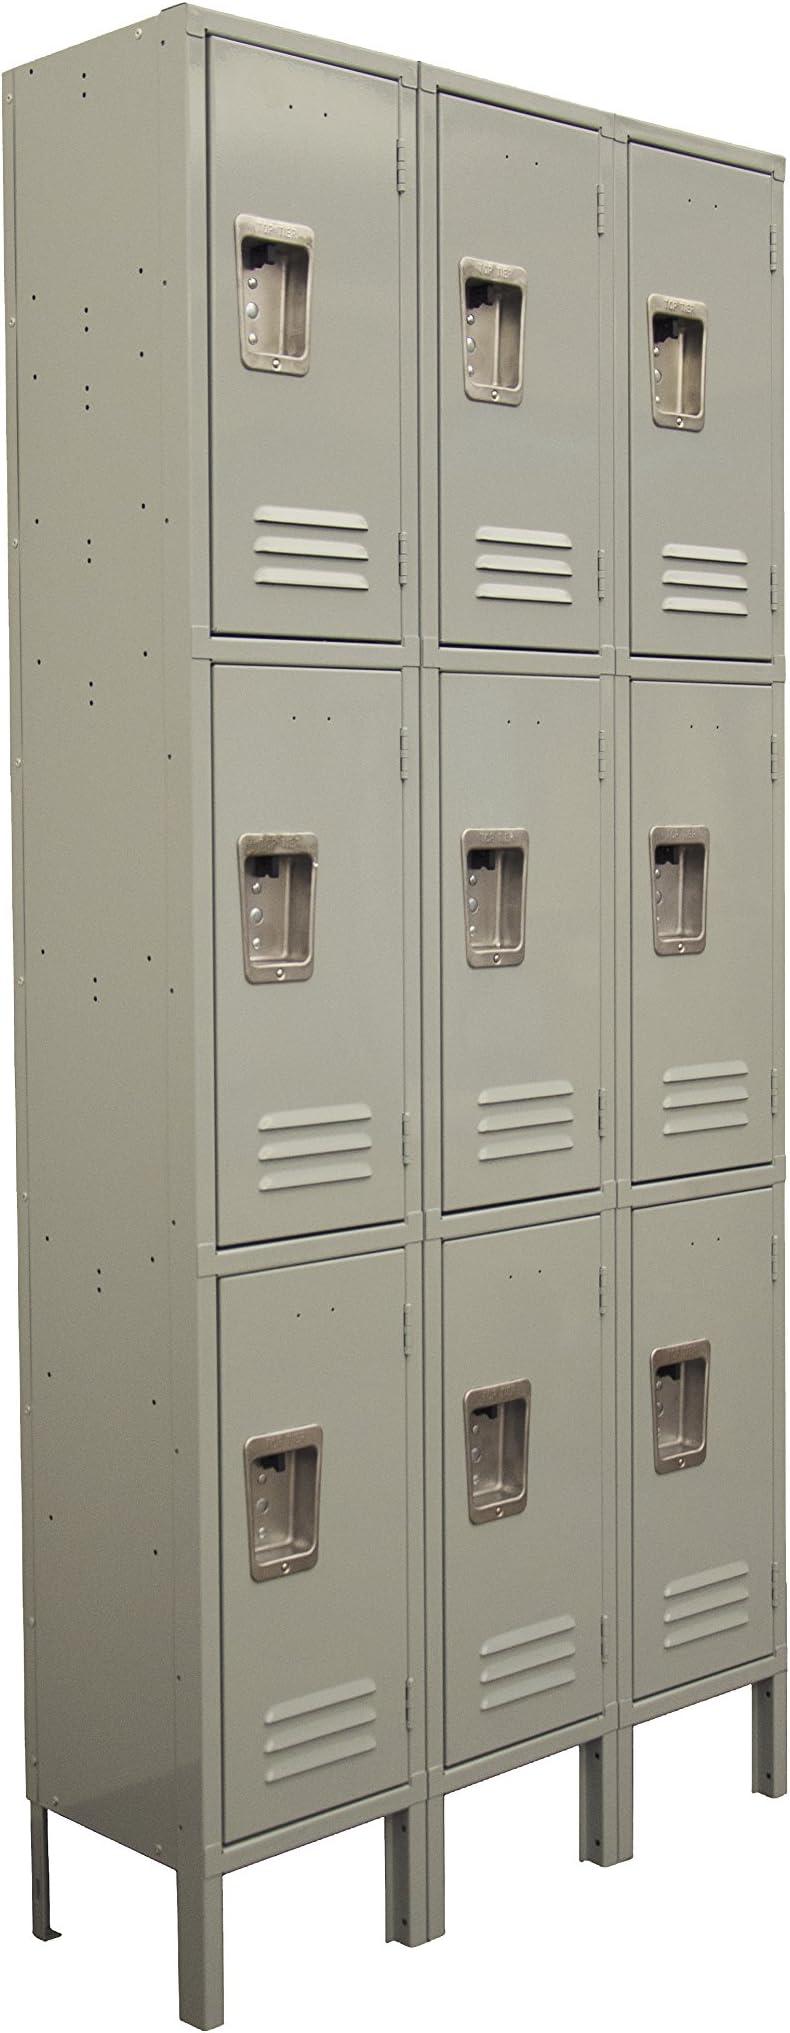 Three Tier Locker 6 feet high 3 Wide Unit w/ 9 Doors with Louvers 12W x 12D x 78H Unassembled Gray Metal Locker Perfect as a School Locker, Gym Locker or Lockers for Employees